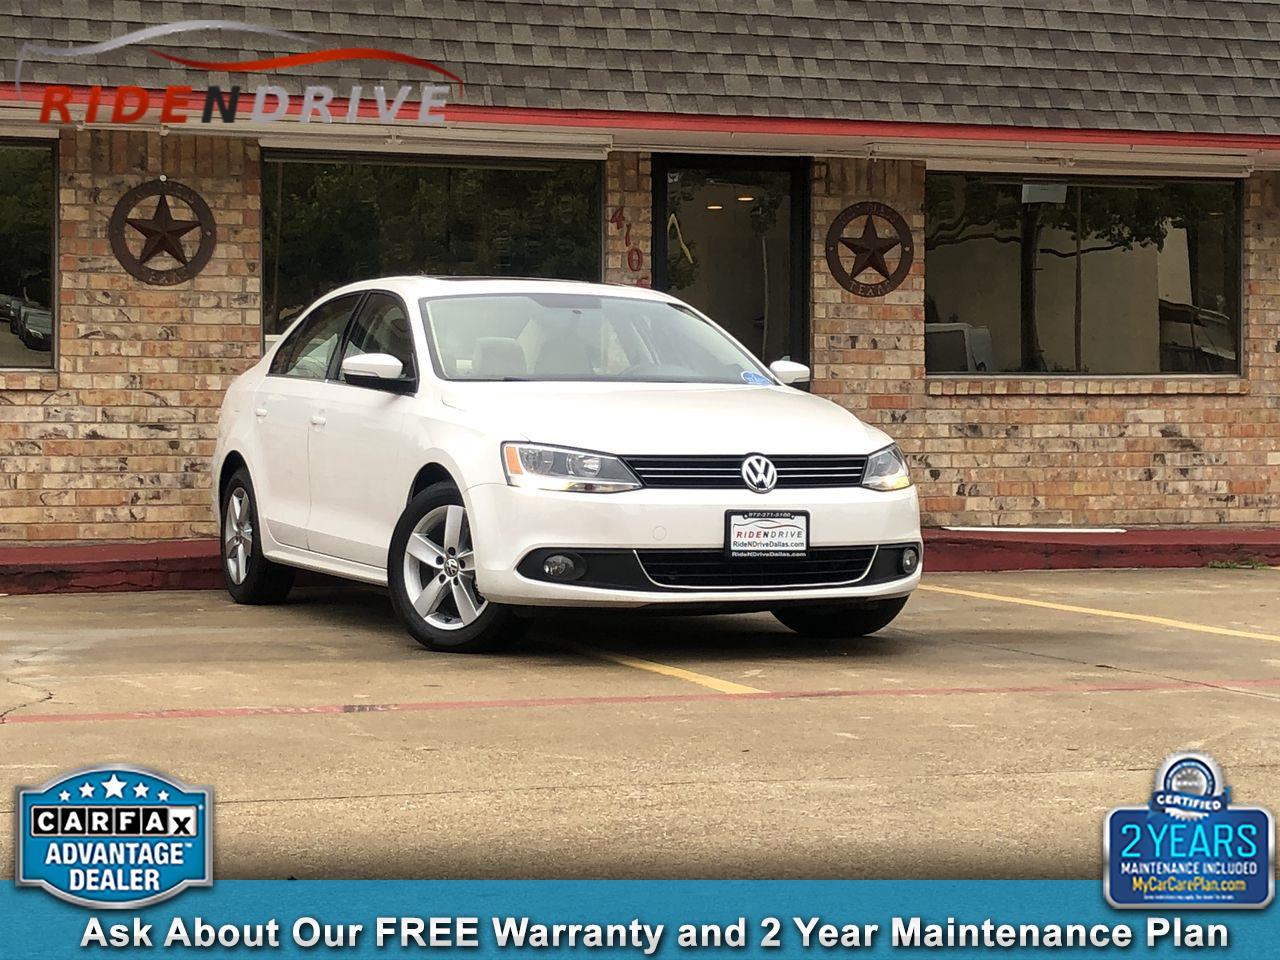 2012 Volkswagen Jetta Sedan 4dr DSG TDI w/Premium & Nav